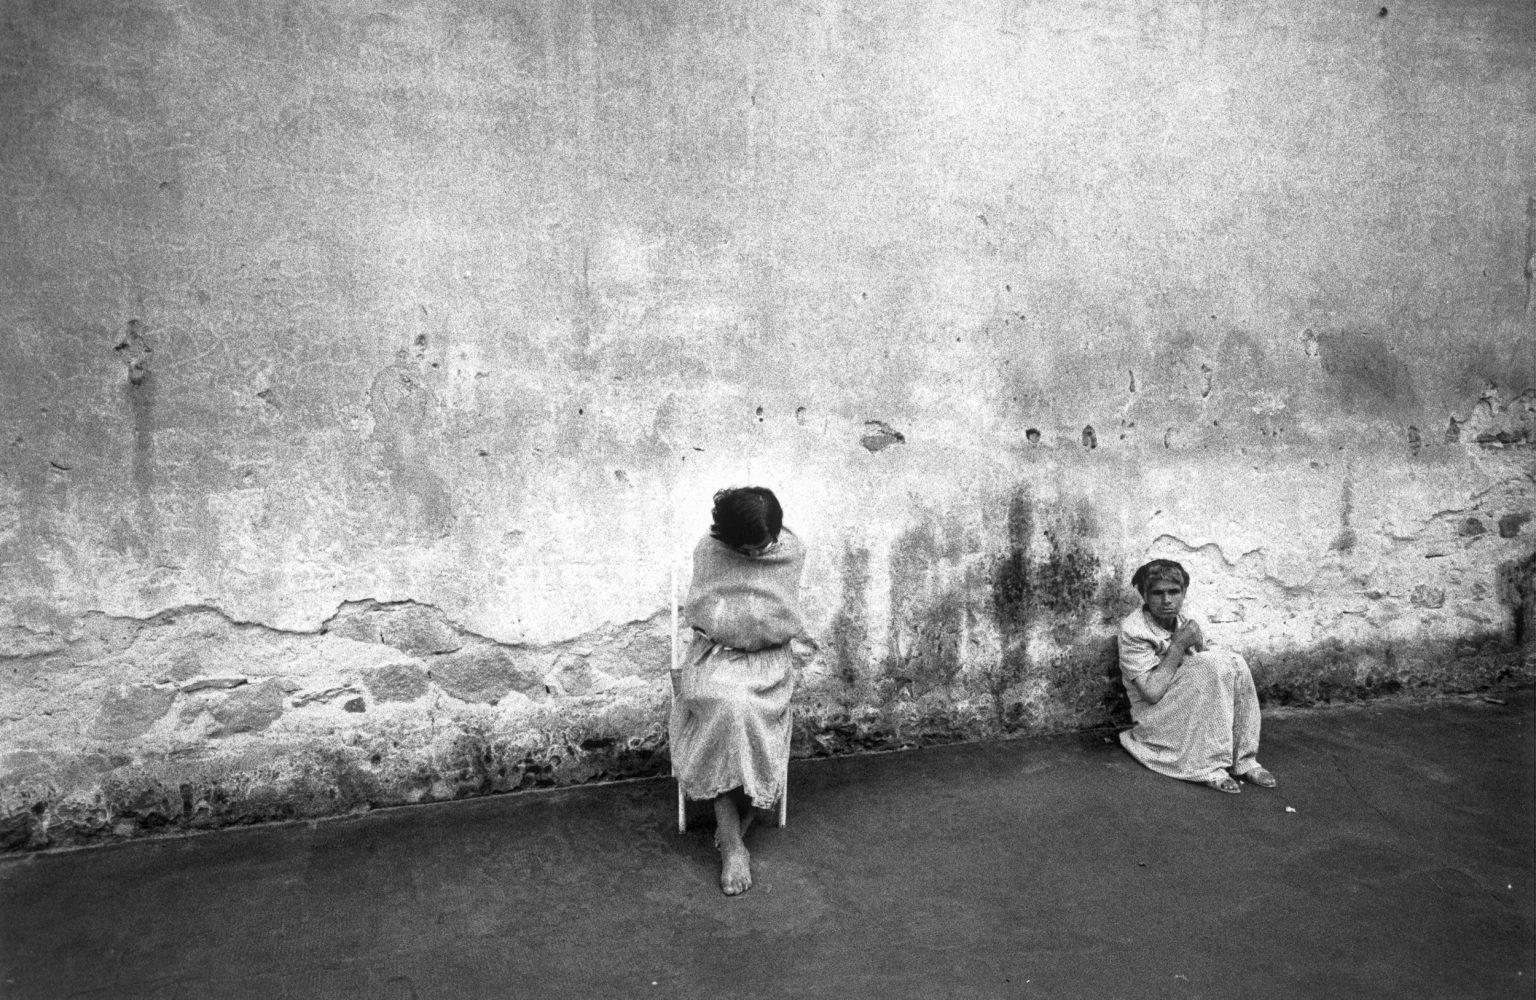 FLORENCE 1968 - PATIENTS OF A MENTAL HOSPITAL - FIRENZE 1968 - PAZIENTI DI UN ISTITUTO PSICHIATRICO  *** Local Caption *** 00103787